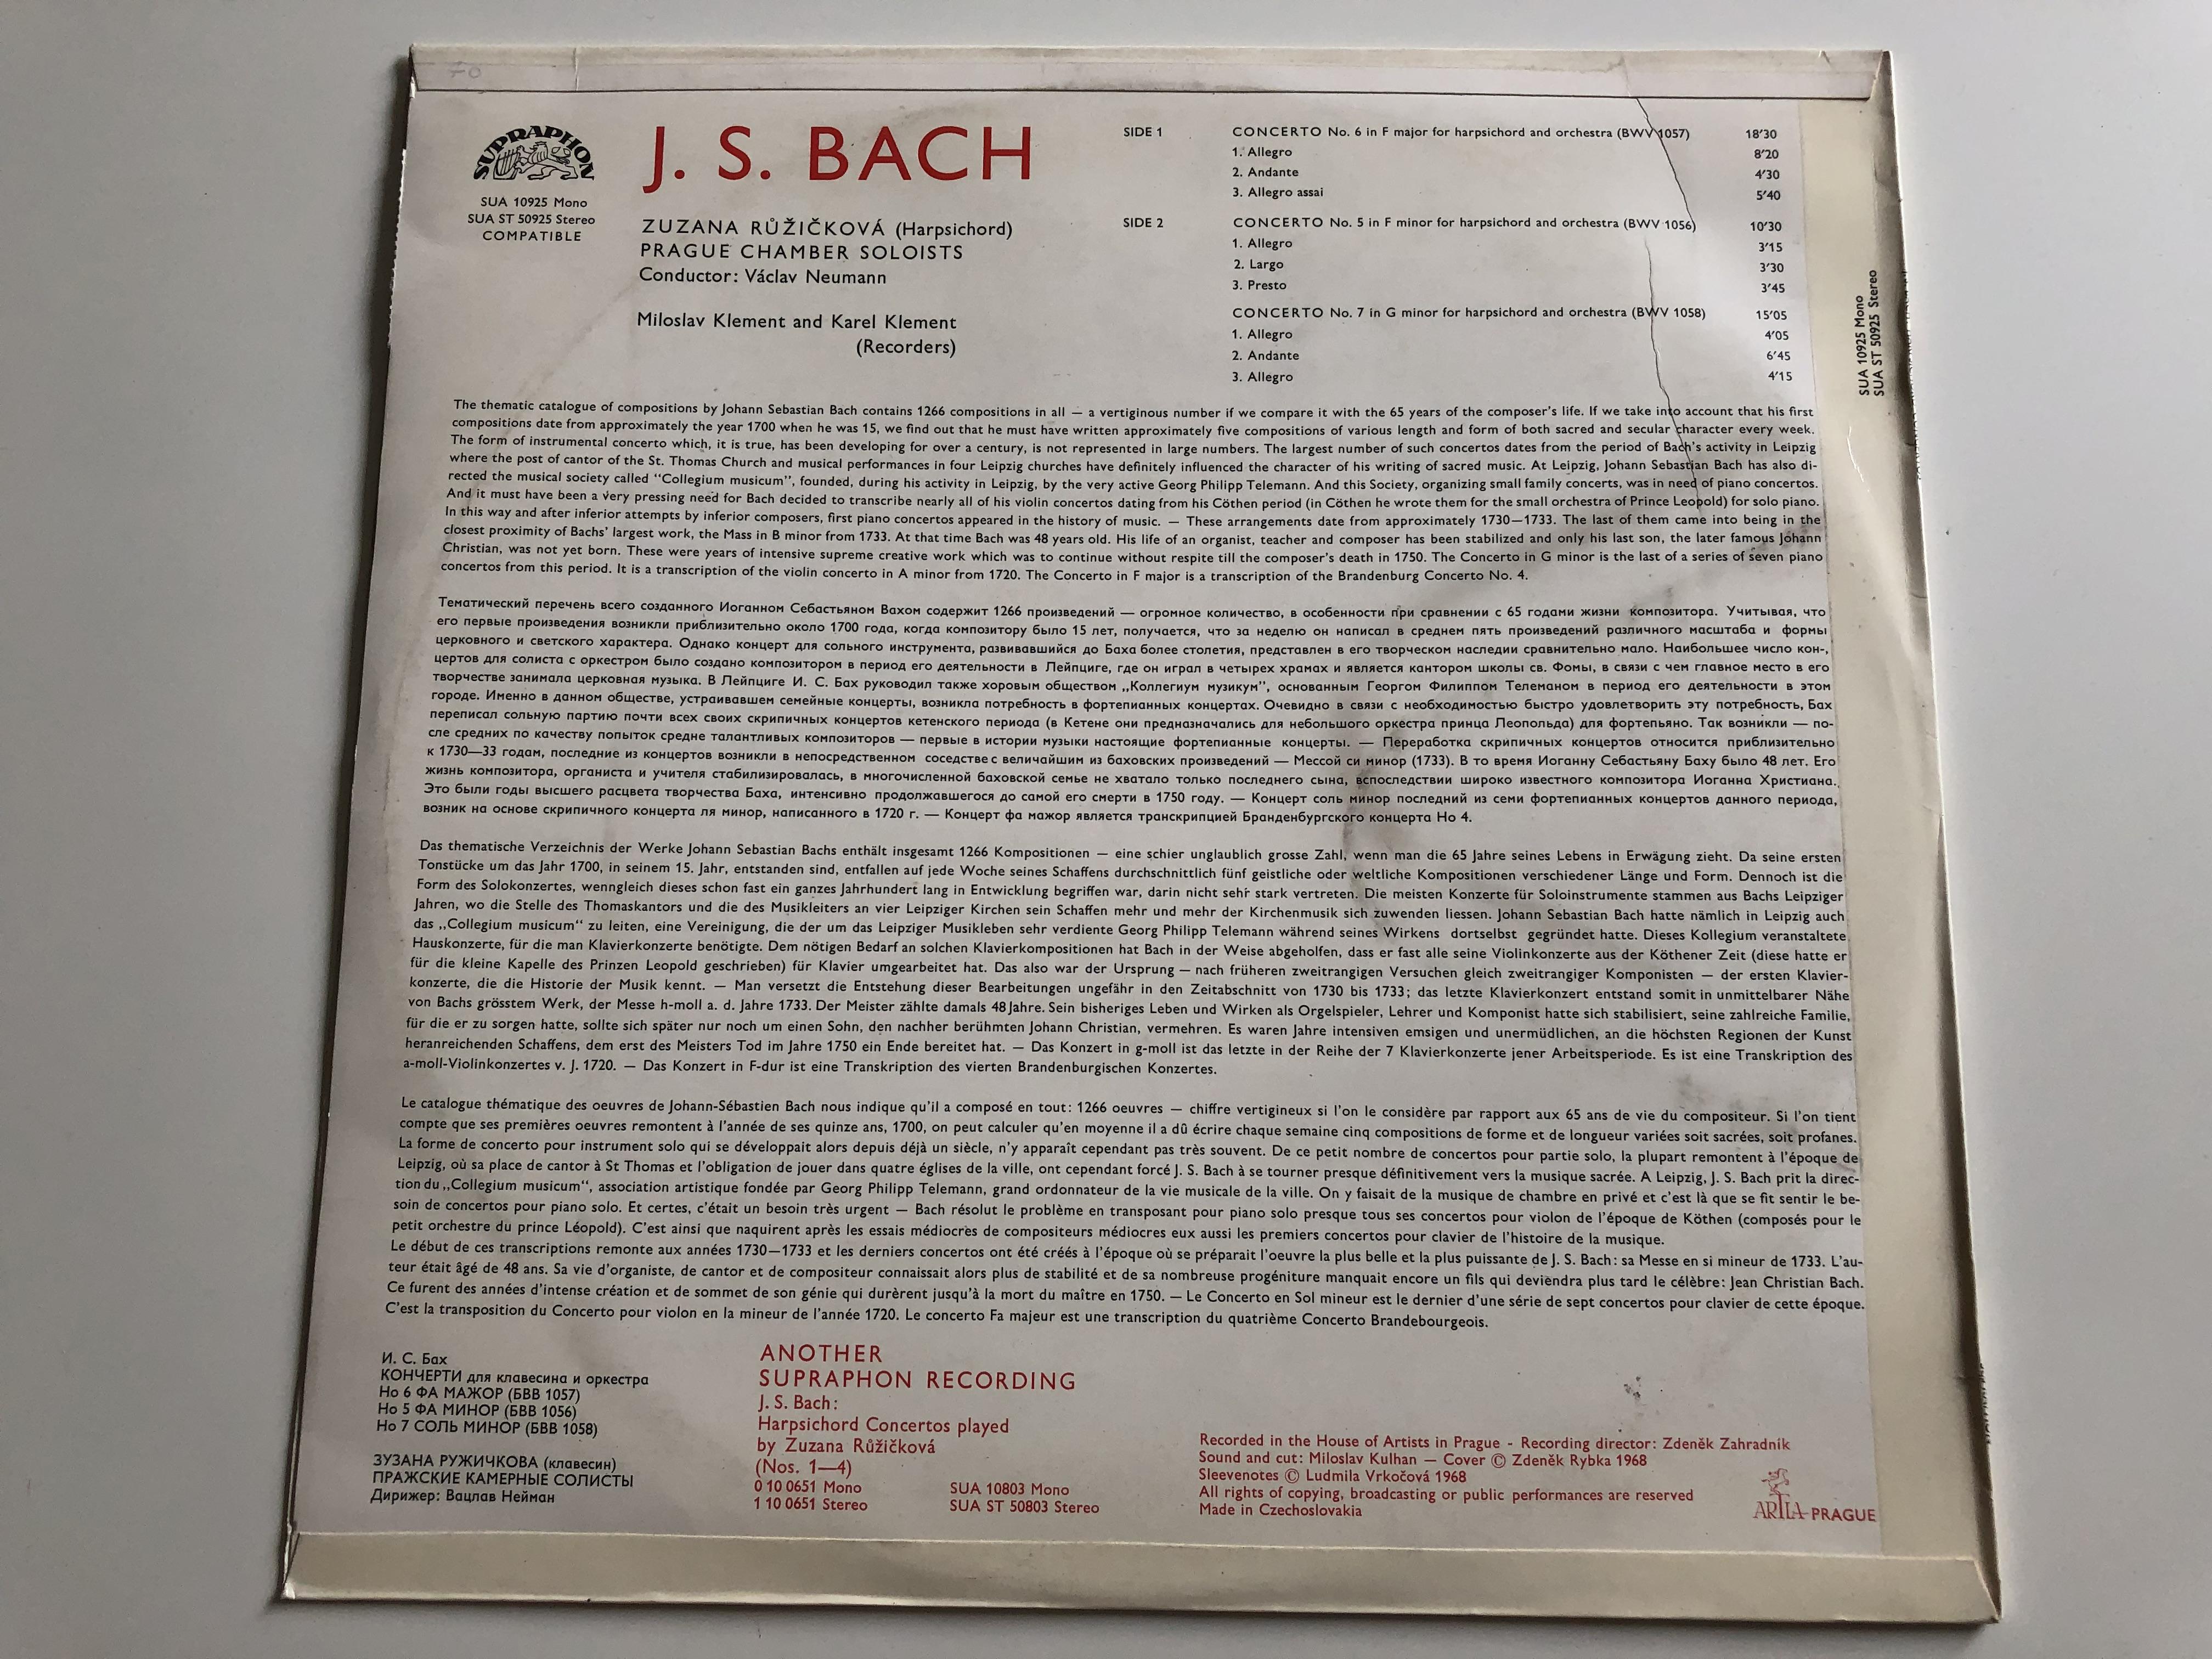 j.-s.-bach-harpsichord-concertos-nos.-v-in-f-minor-vi-in-f-major-vii-in-g-minor-zuzana-r-i-kov-prague-chamber-soloists-conductor-v-clav-neumann-supraphon-lp-sua-10925-sua-st-50.jpg